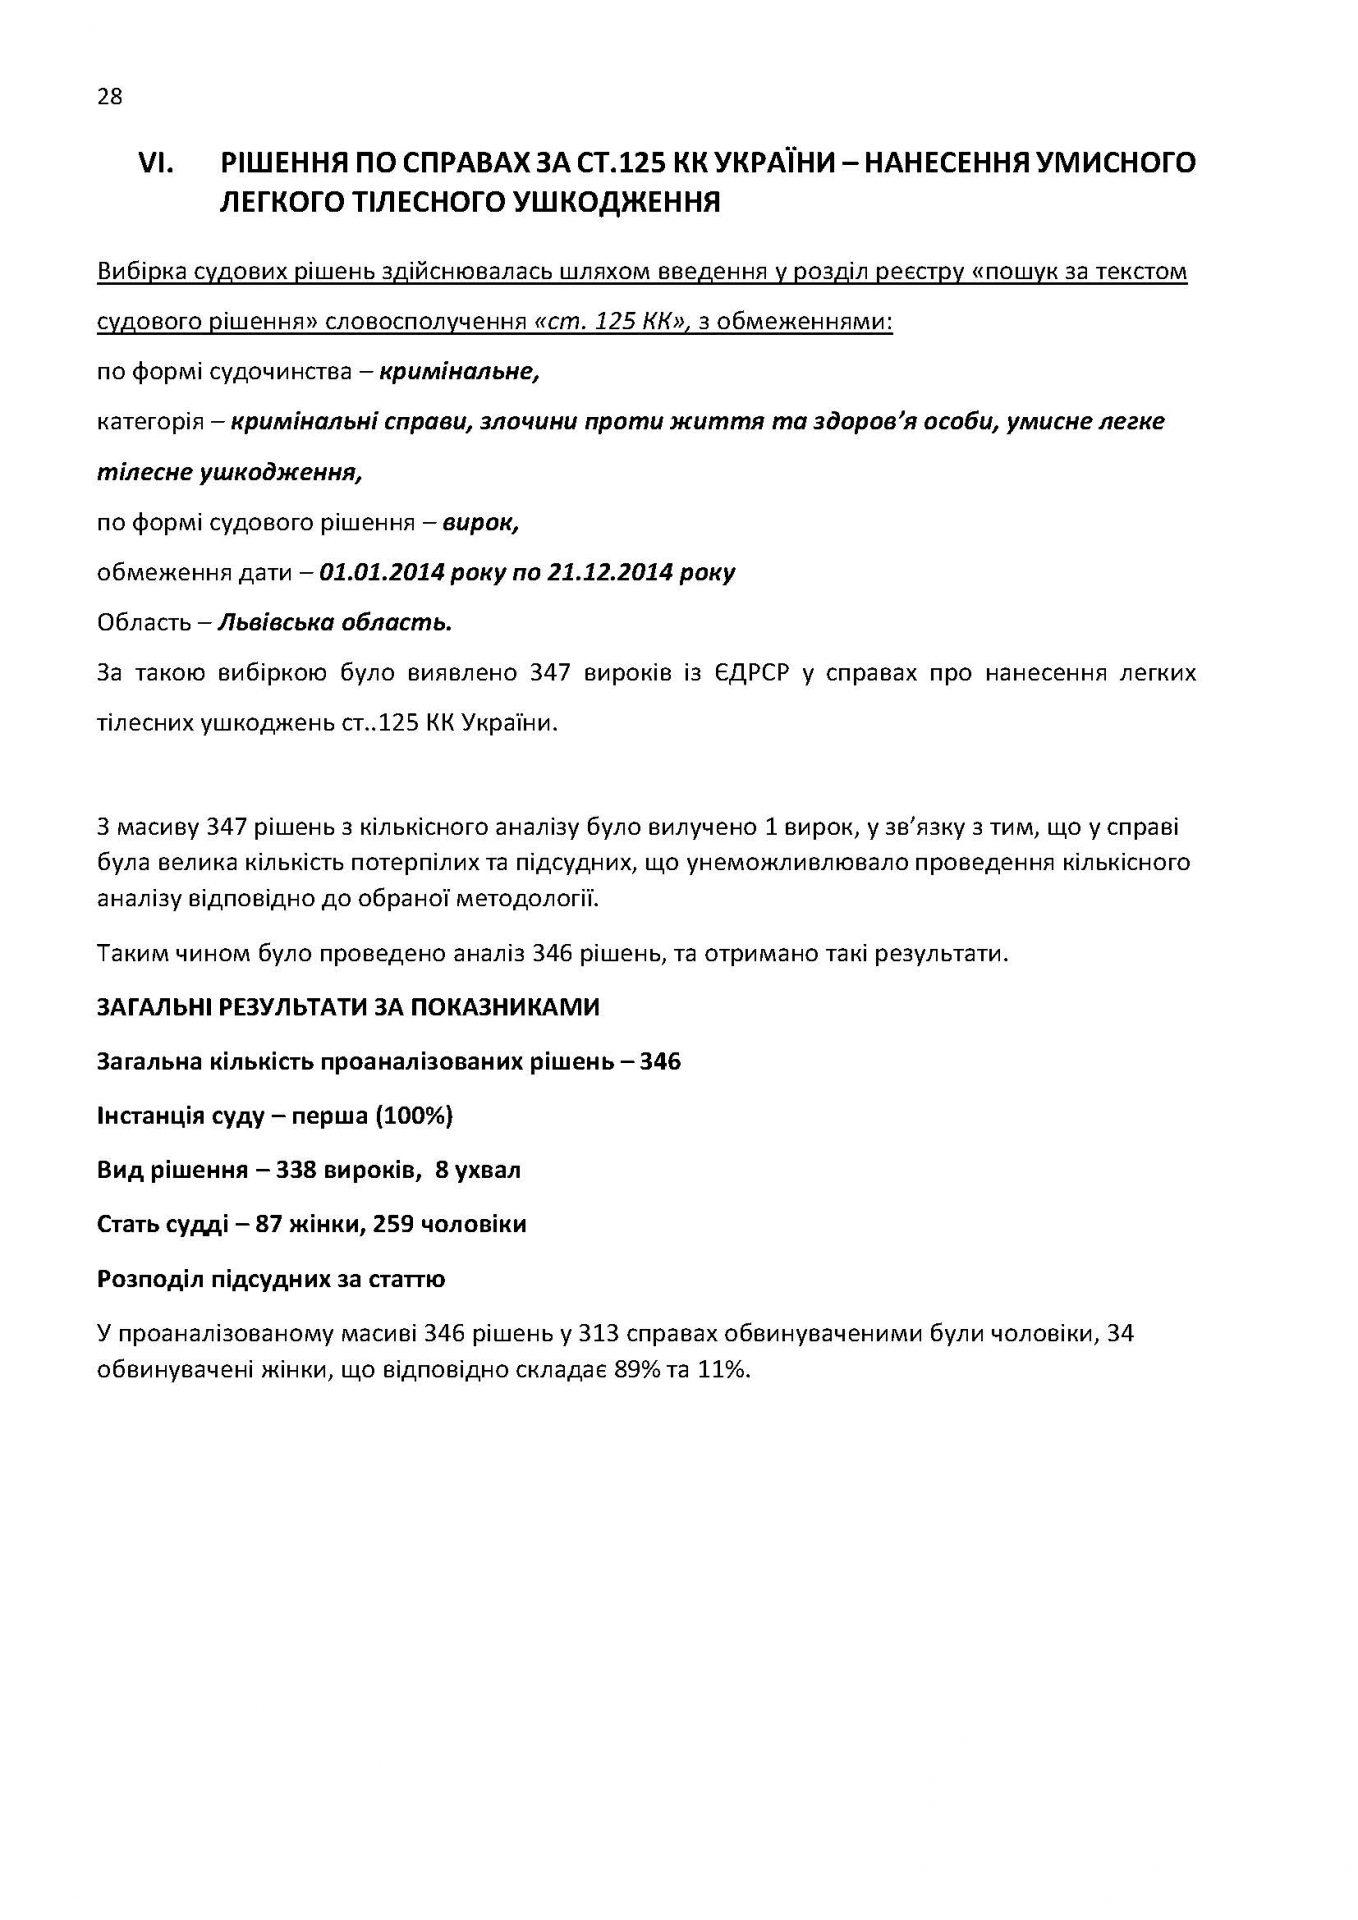 Draft Report monitoring print USAID_Страница_28